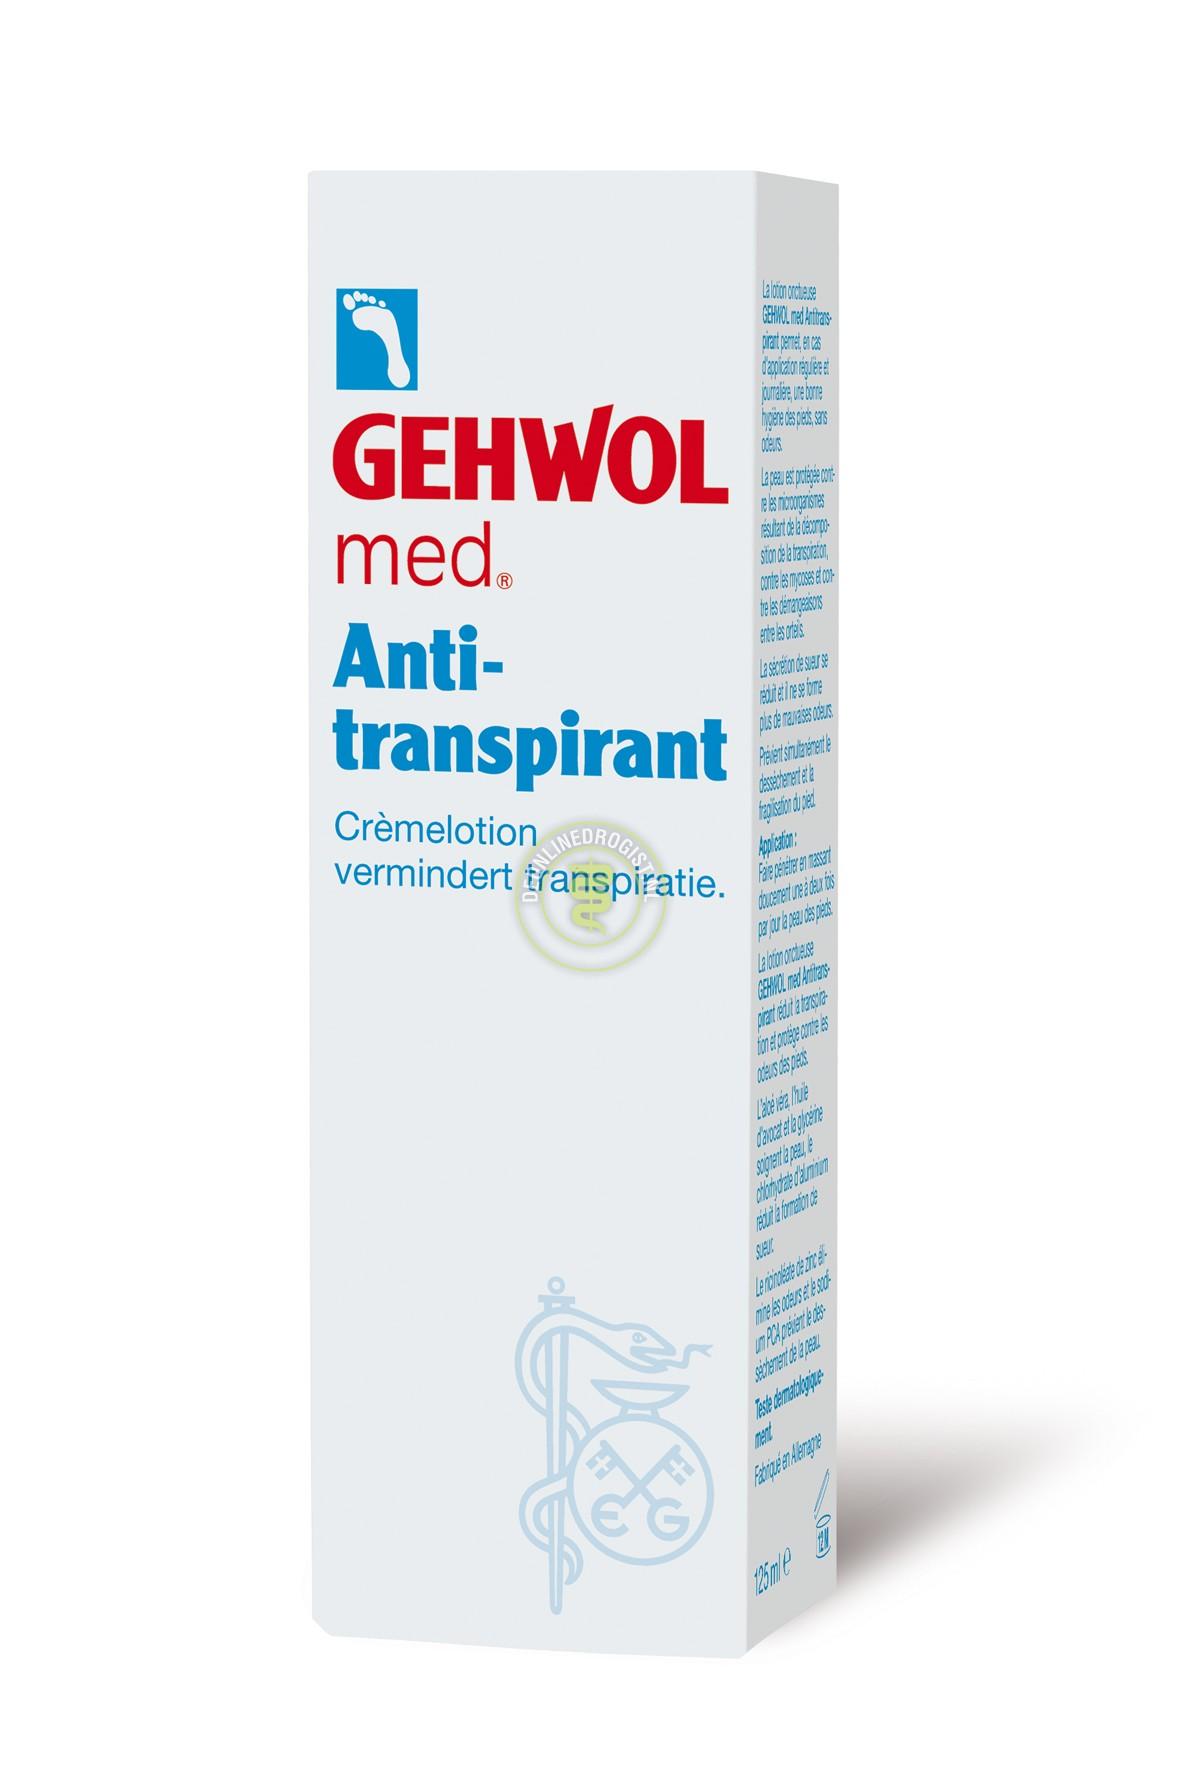 GEHWOL Крем-лосьон антиперспирант 125 мл - Дезодоранты